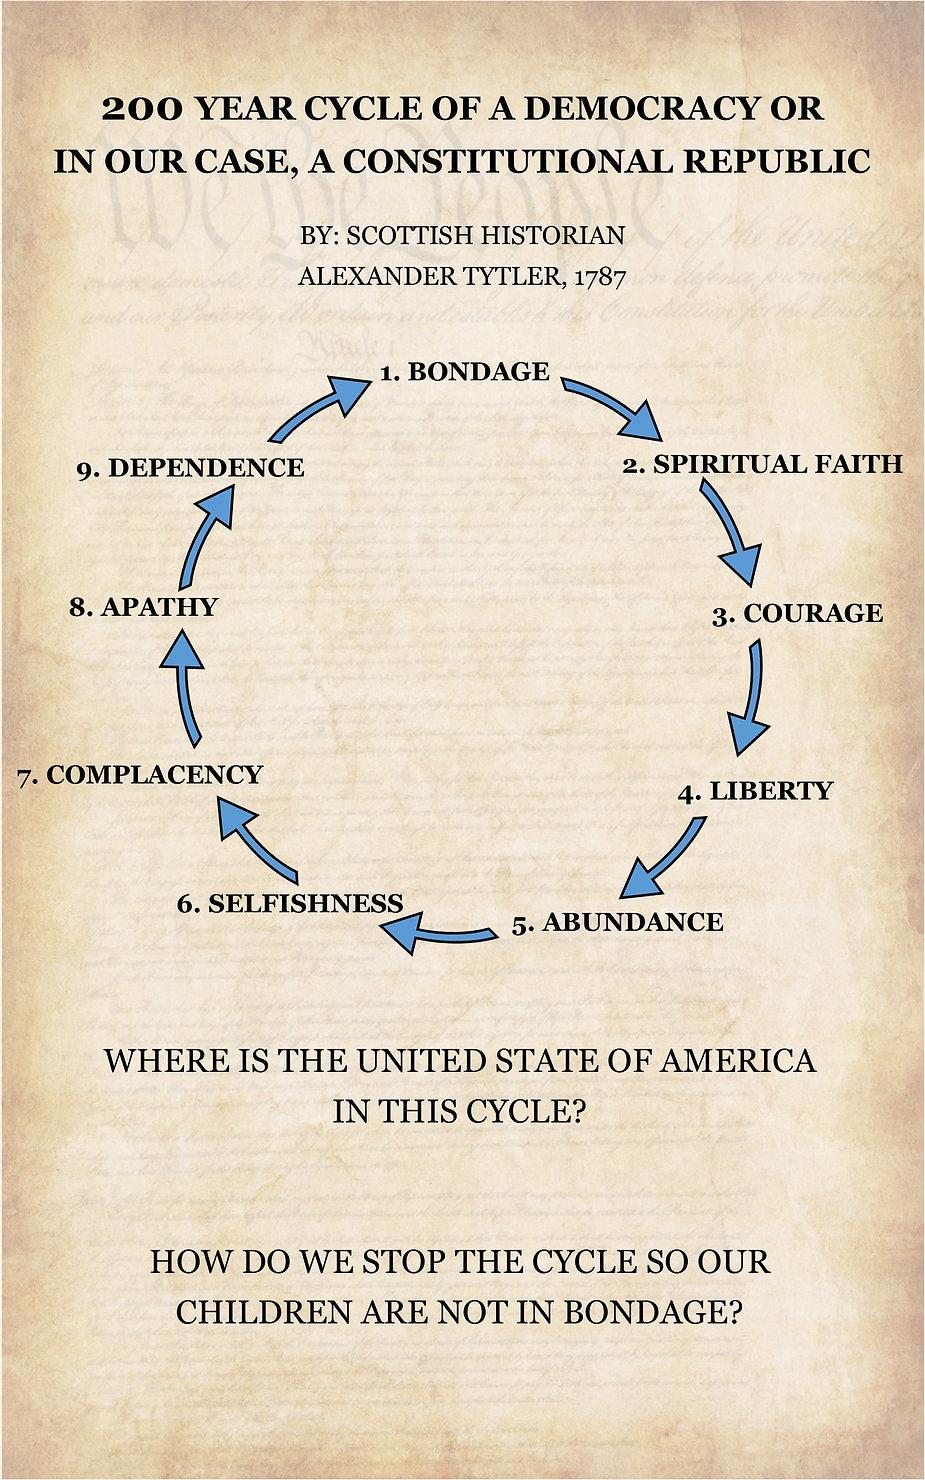 Cycle of Democracy.jpg